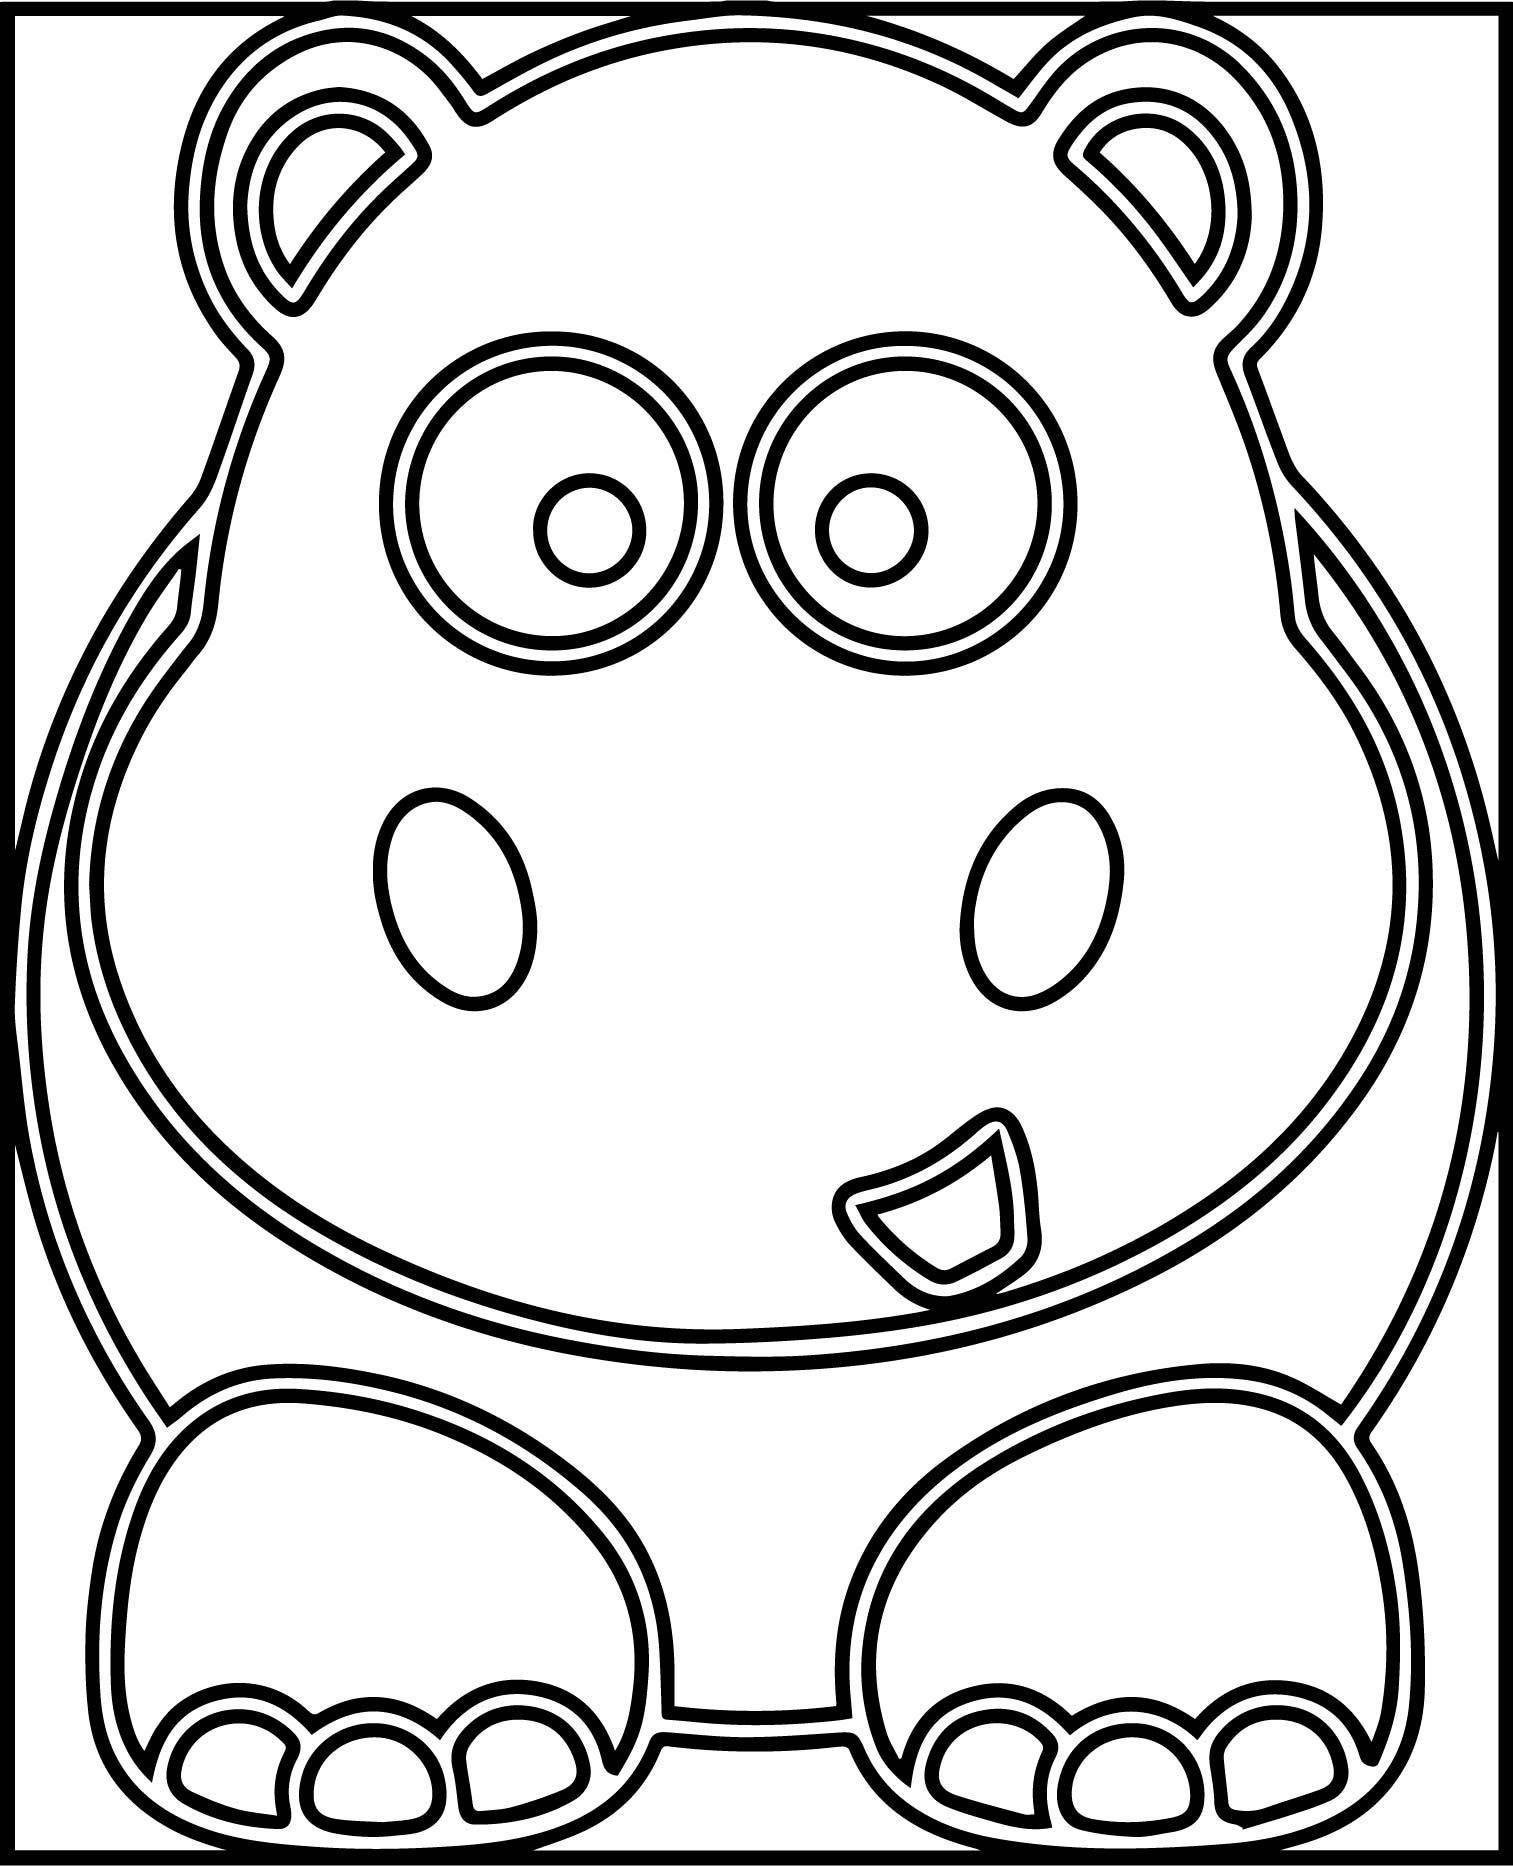 Rhino Coloring Page | Wecoloringpage.com